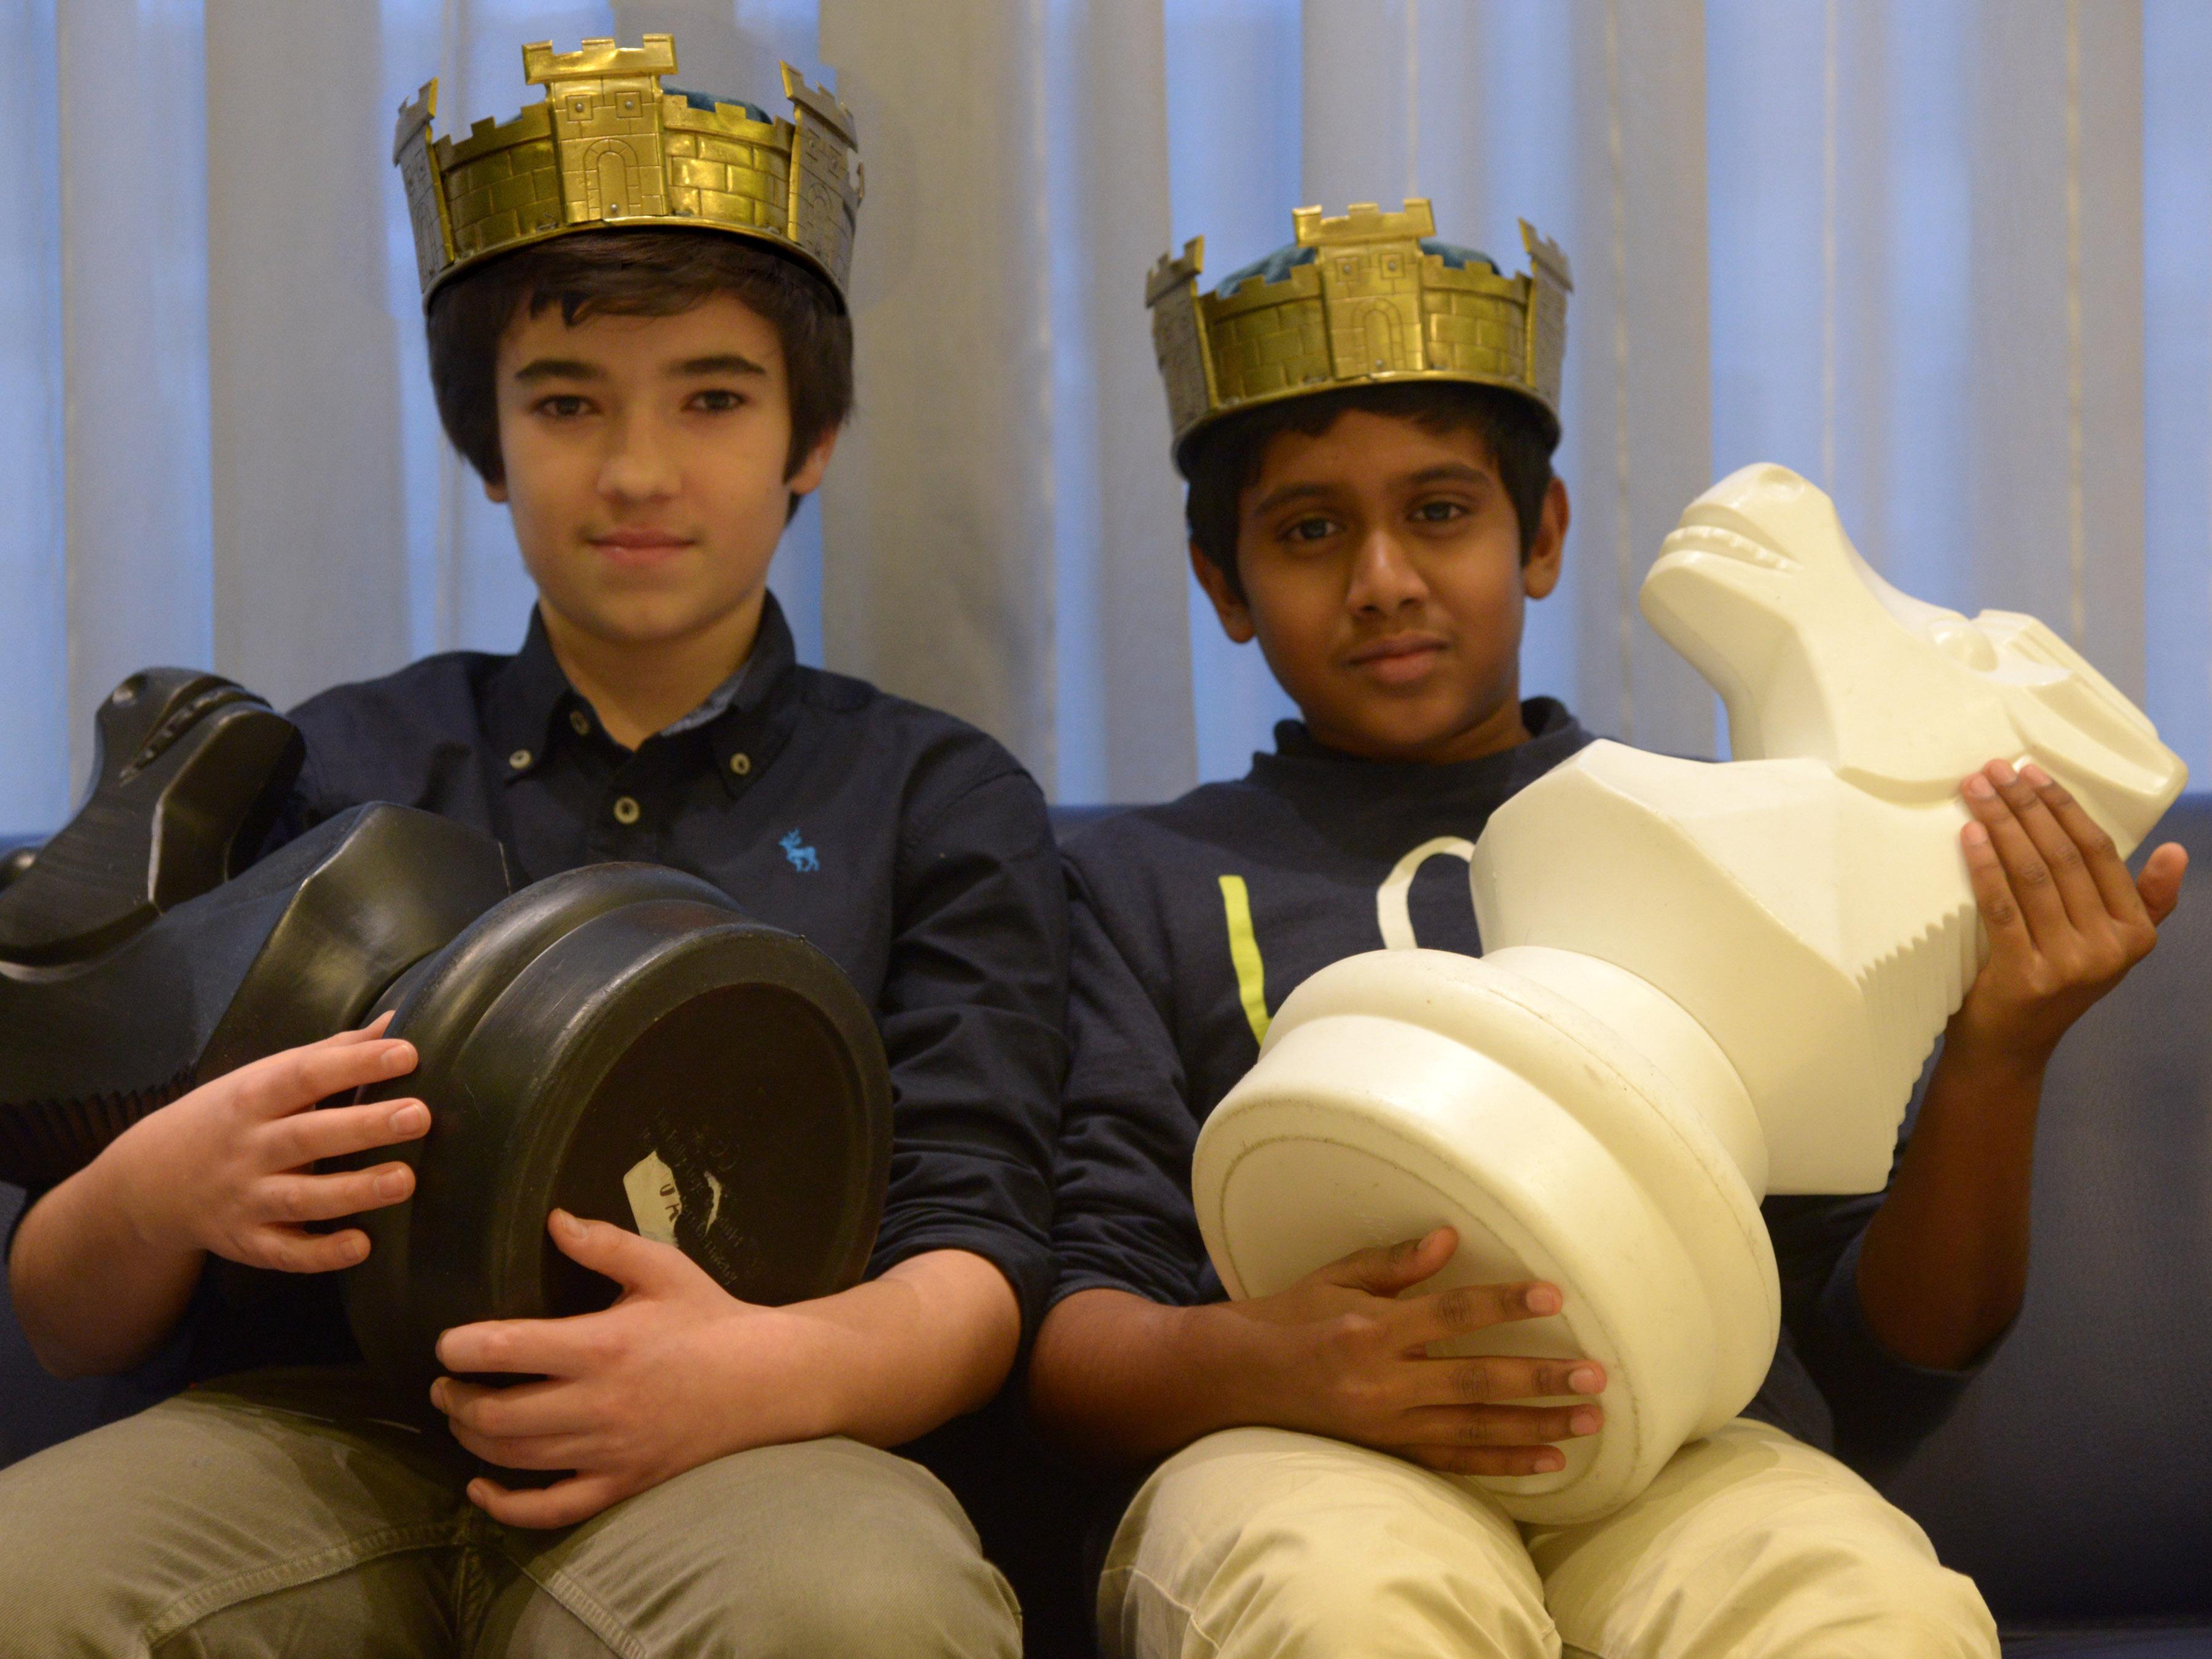 Jugendschachkönige aus Therwil: Max Lo Presti in der Kategorie U16 (links) und Sajithan Sankar in der Kategorie U12.